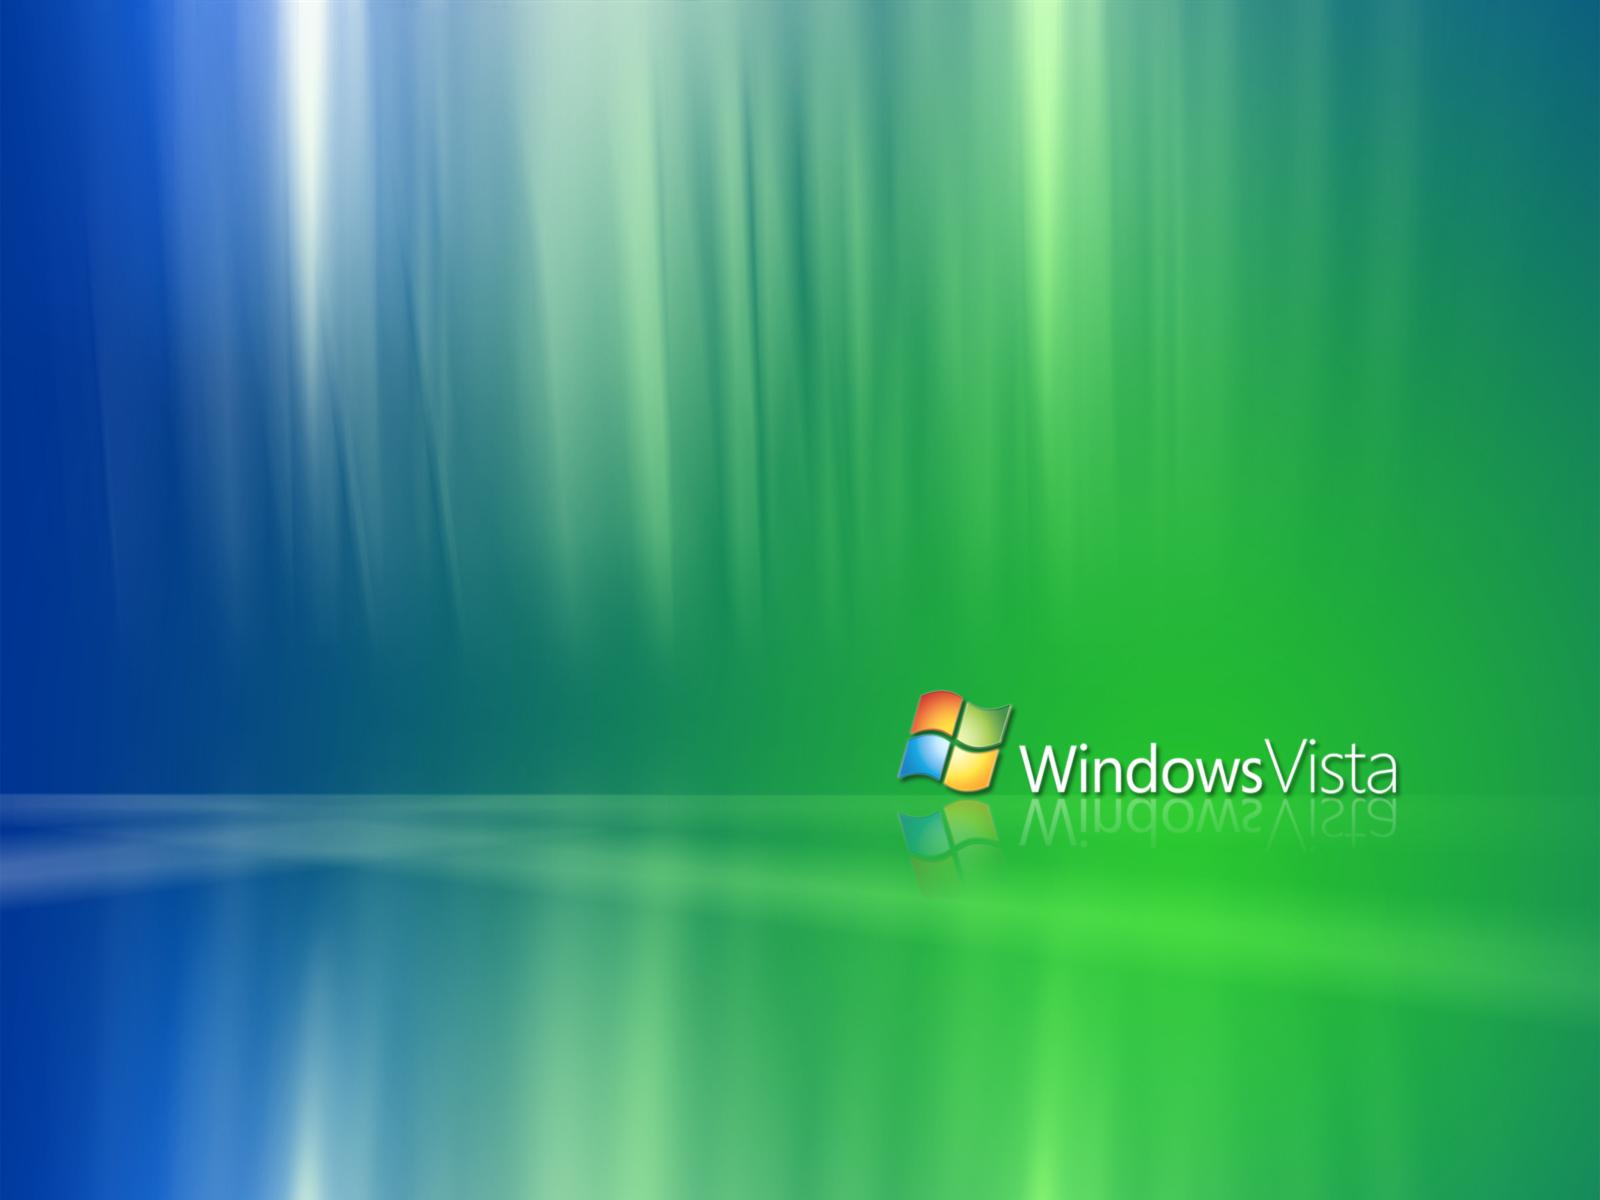 Windows Vista Wallpaper Set 23 « Awesome Wallpapers